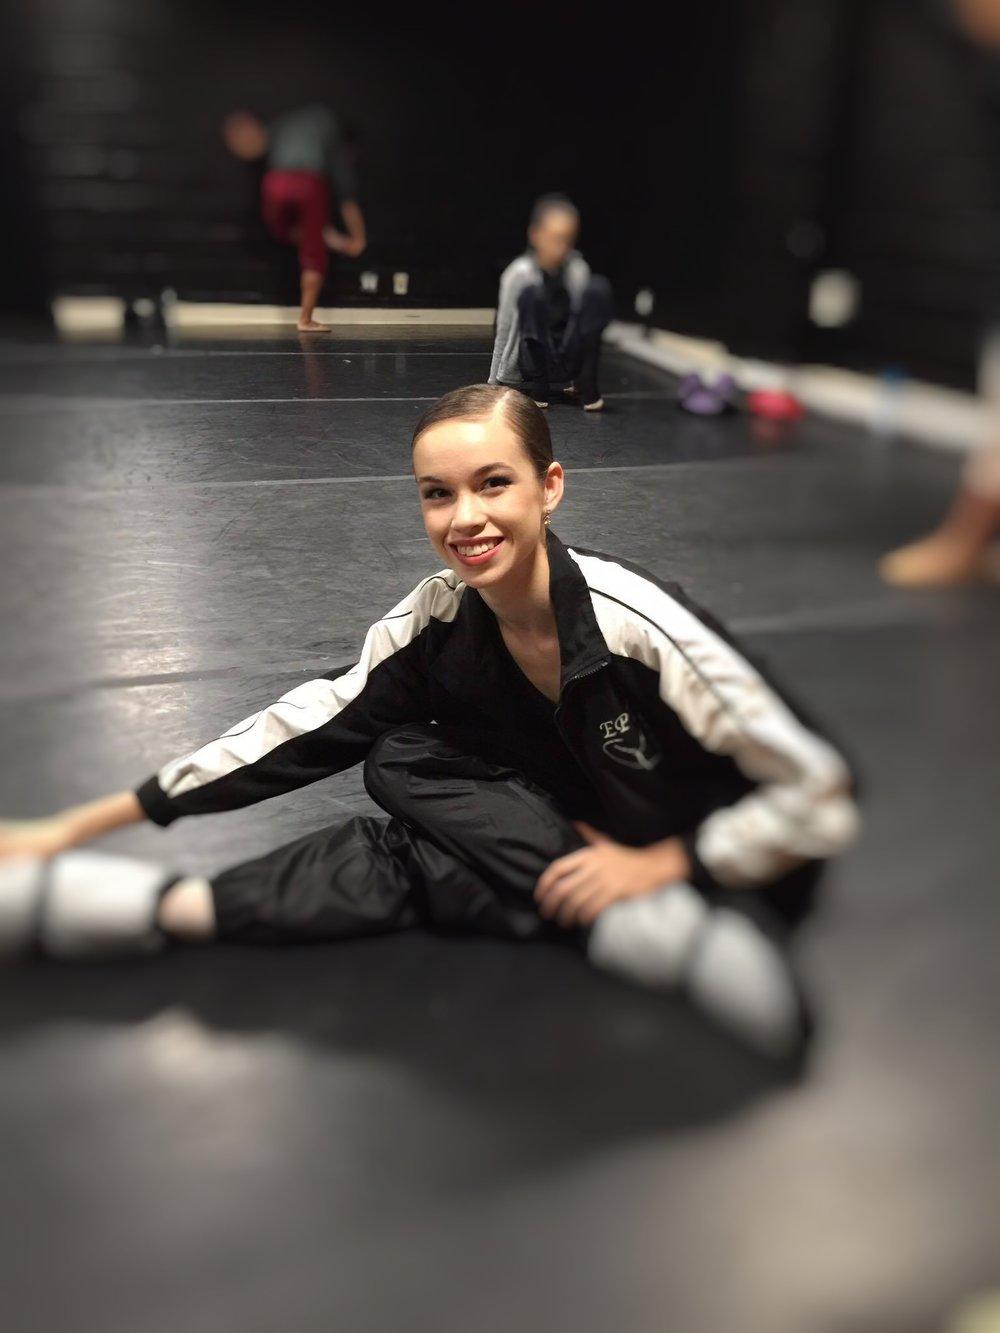 Projection Dance School Elite Performance Aspirant Amia Mason. Amia was a multiple scholarship recipient at the 2016 Youth American Grand Prix.